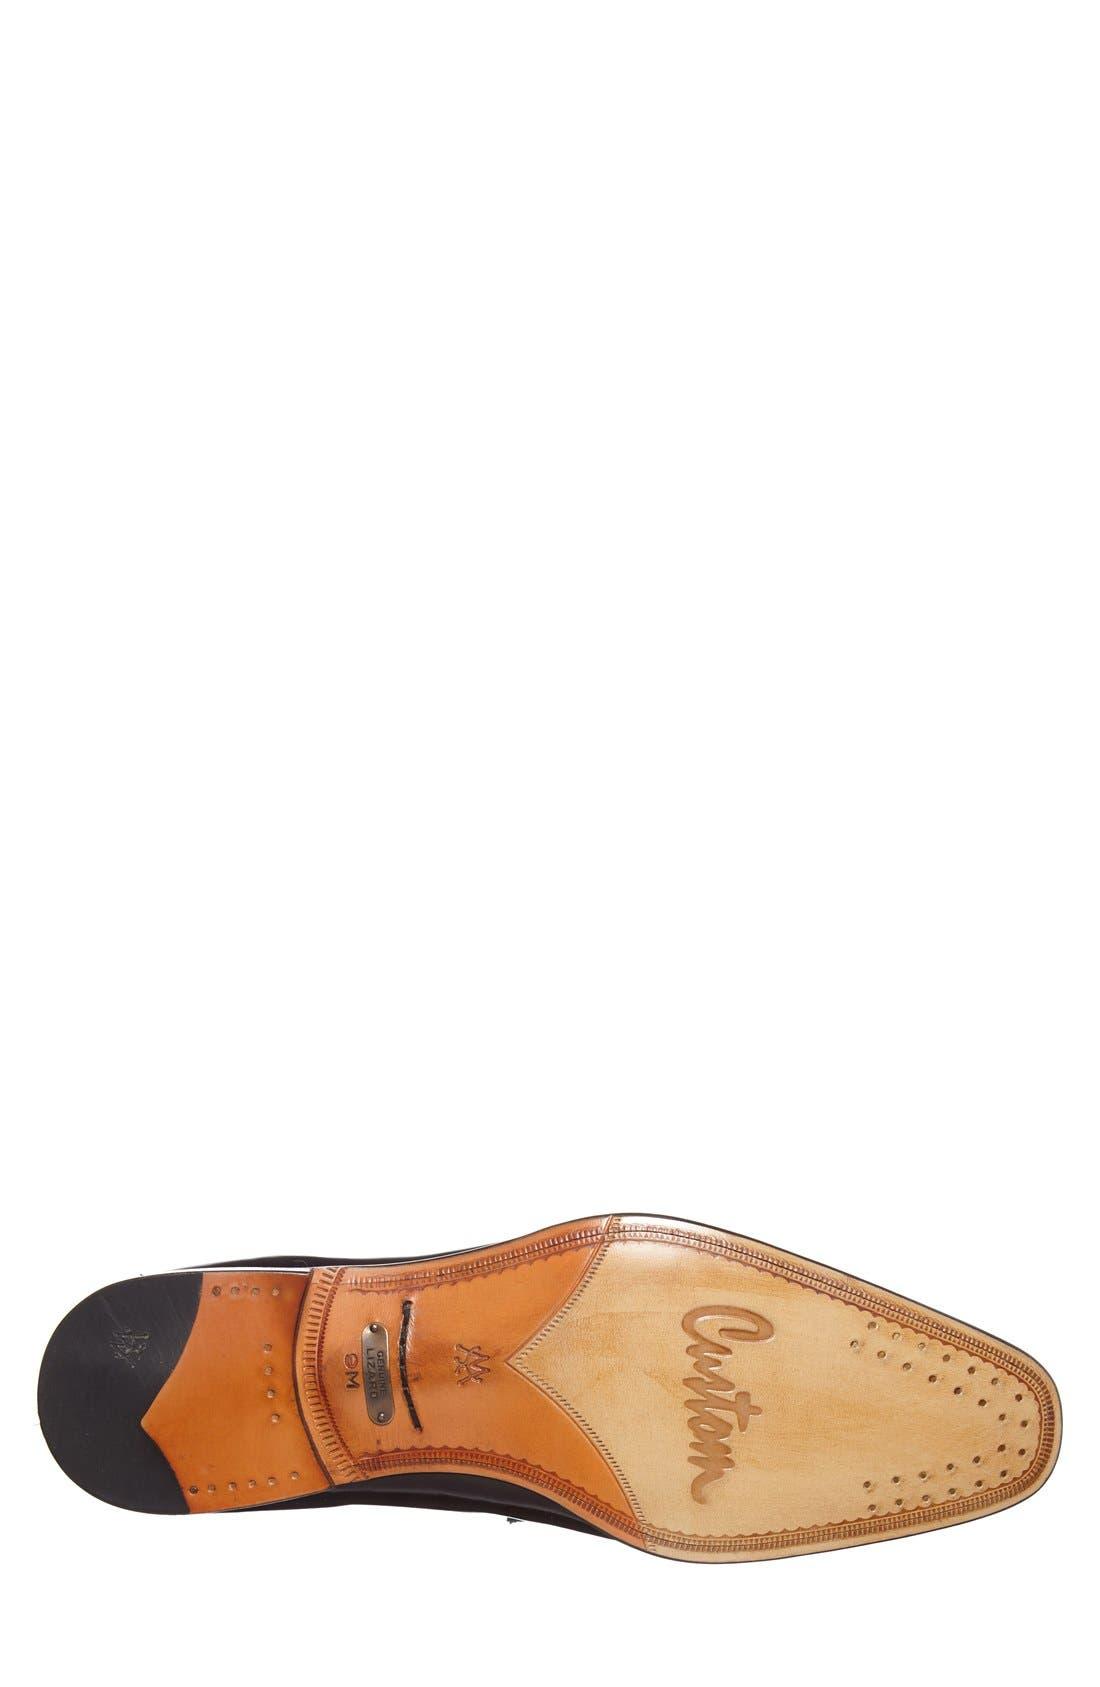 'Obrador' Lizard Leather Tassel Loafer,                             Alternate thumbnail 4, color,                             Black